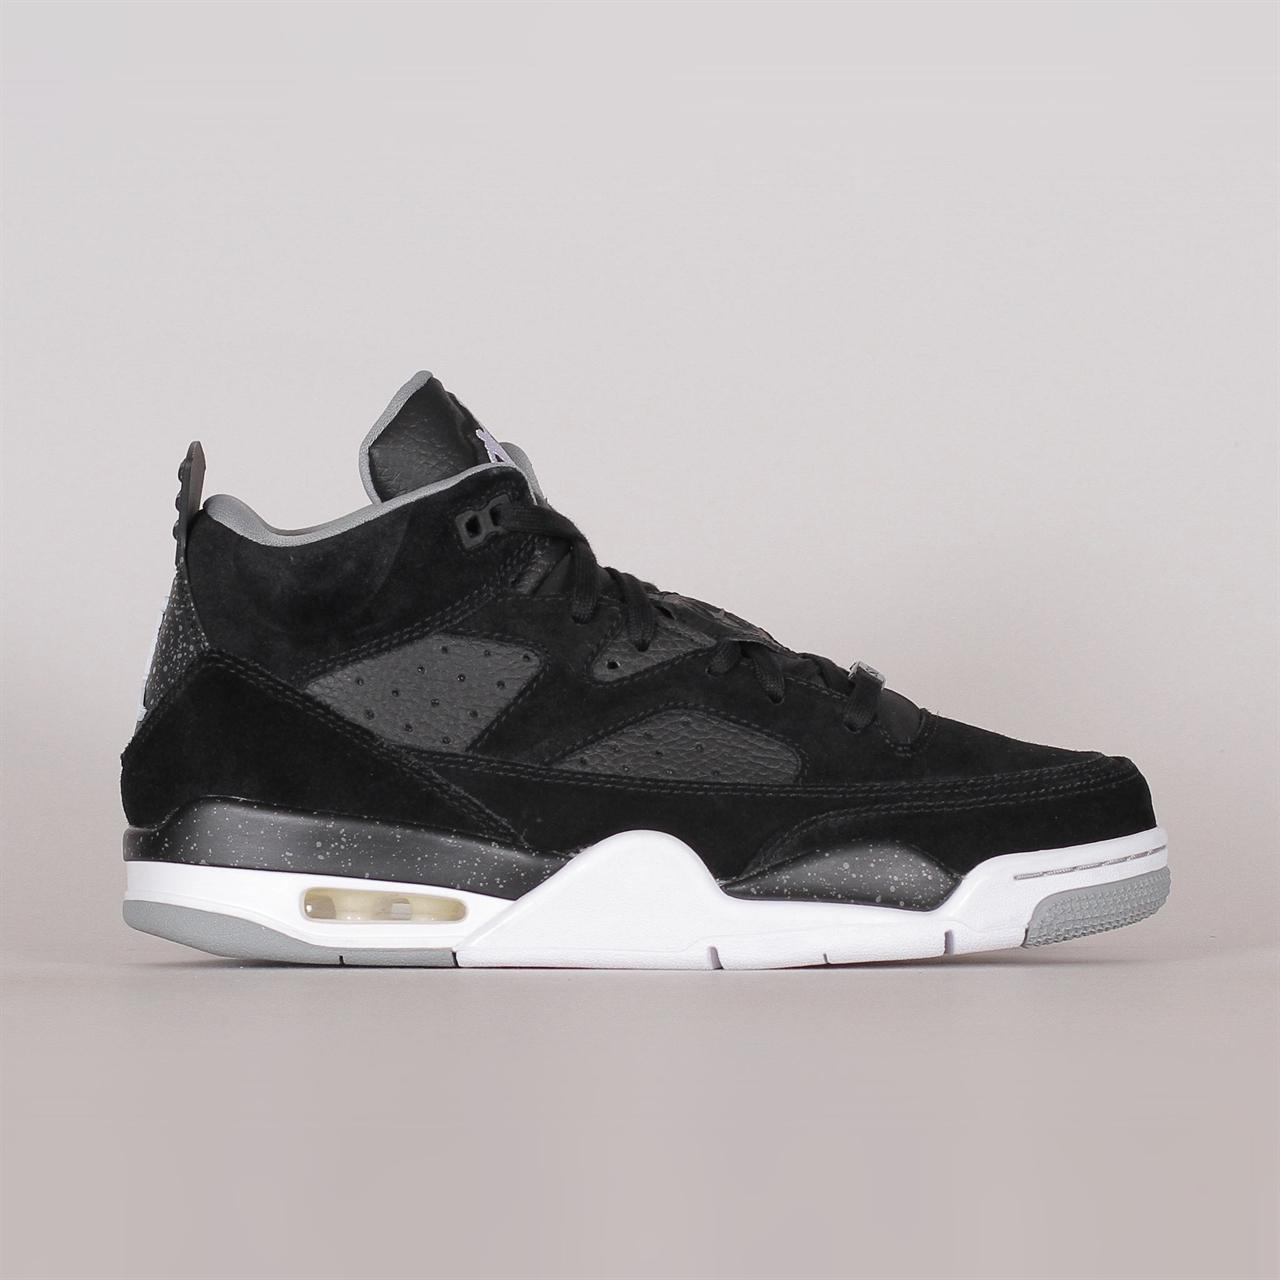 lowest price 74fbe a1b56 Shelta - Nike Air Jordan Son Of Low (580603-001)